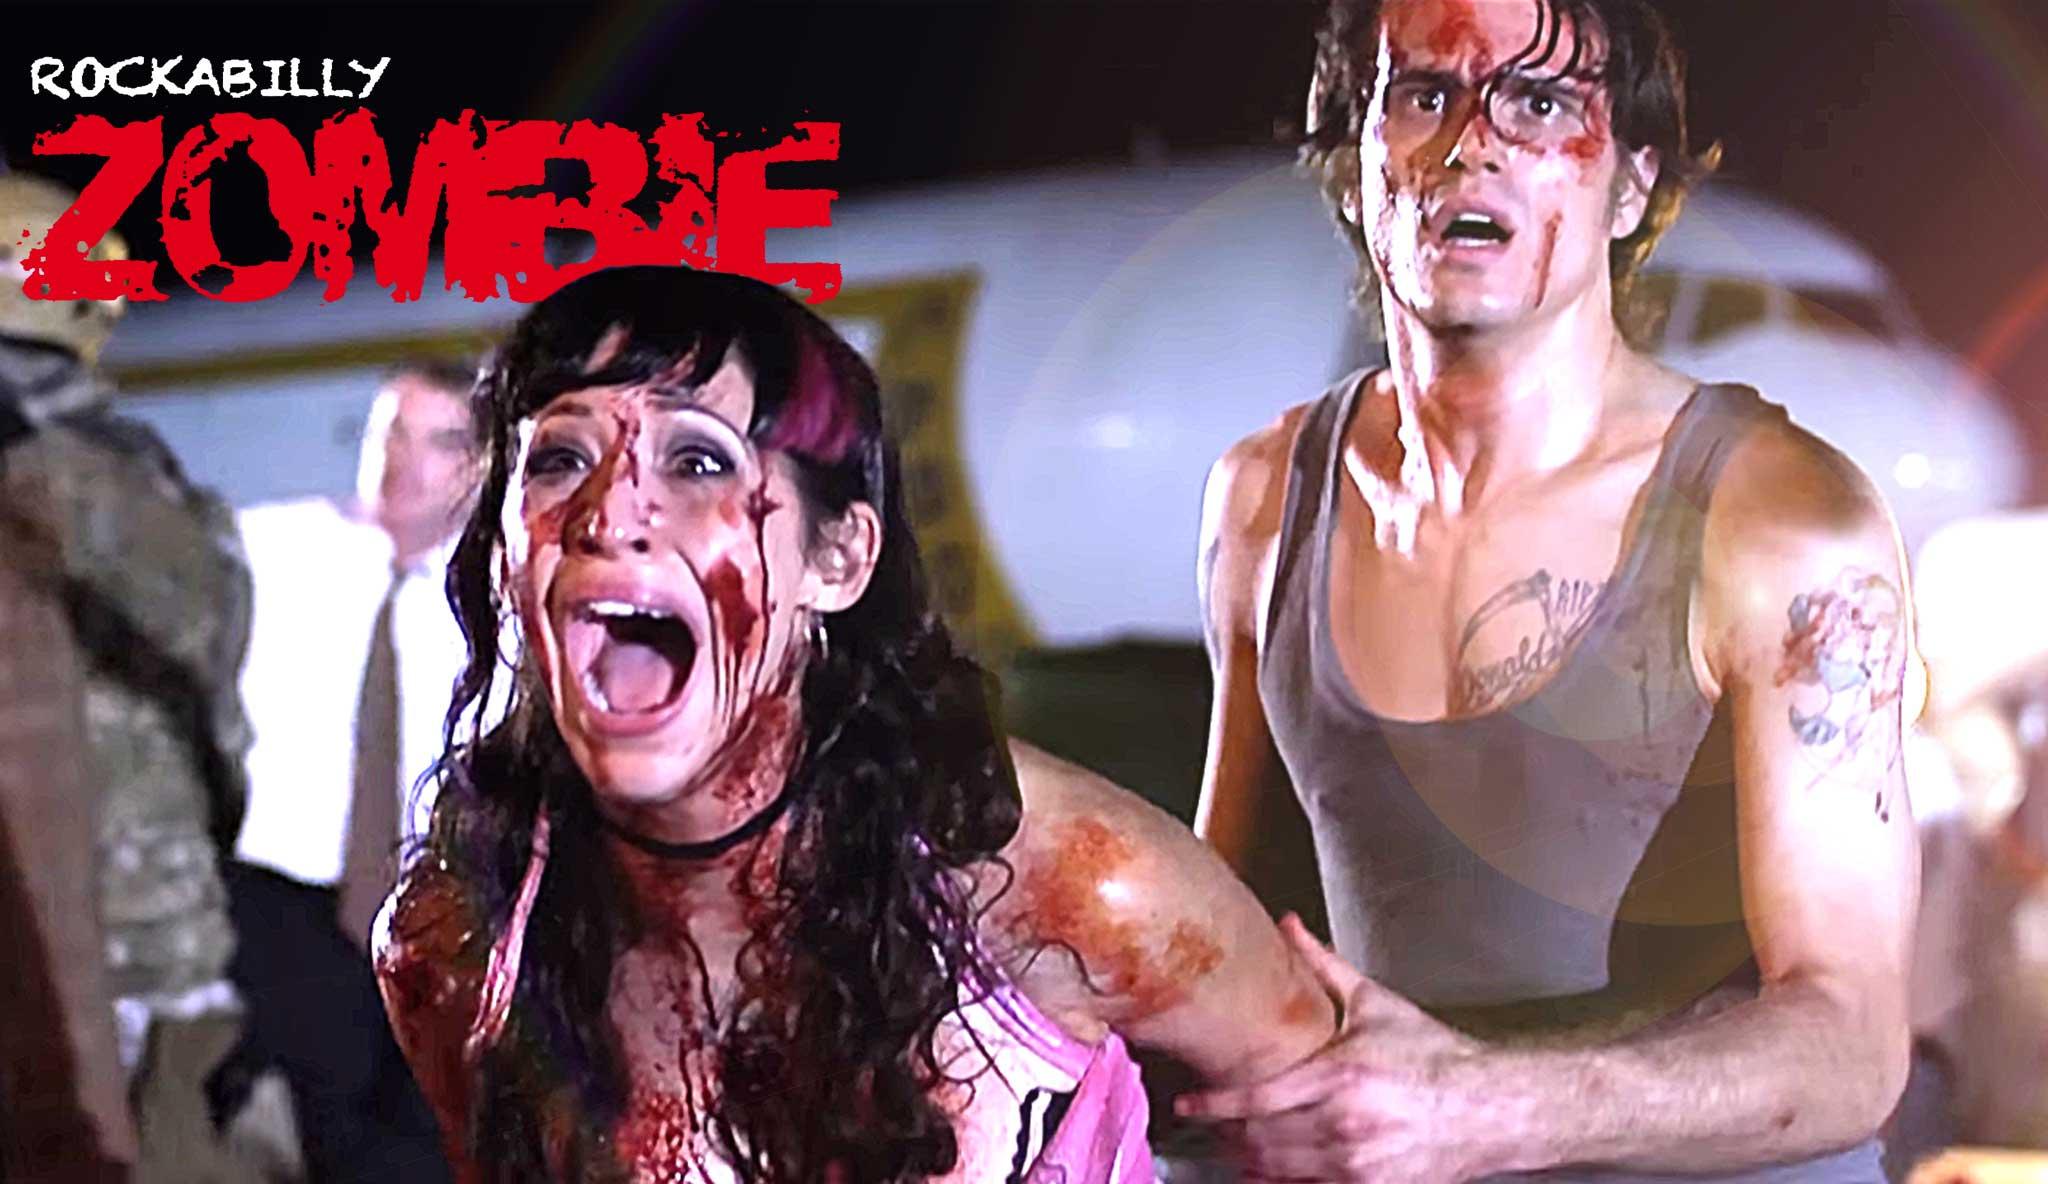 rockabilly-zombie\header.jpg